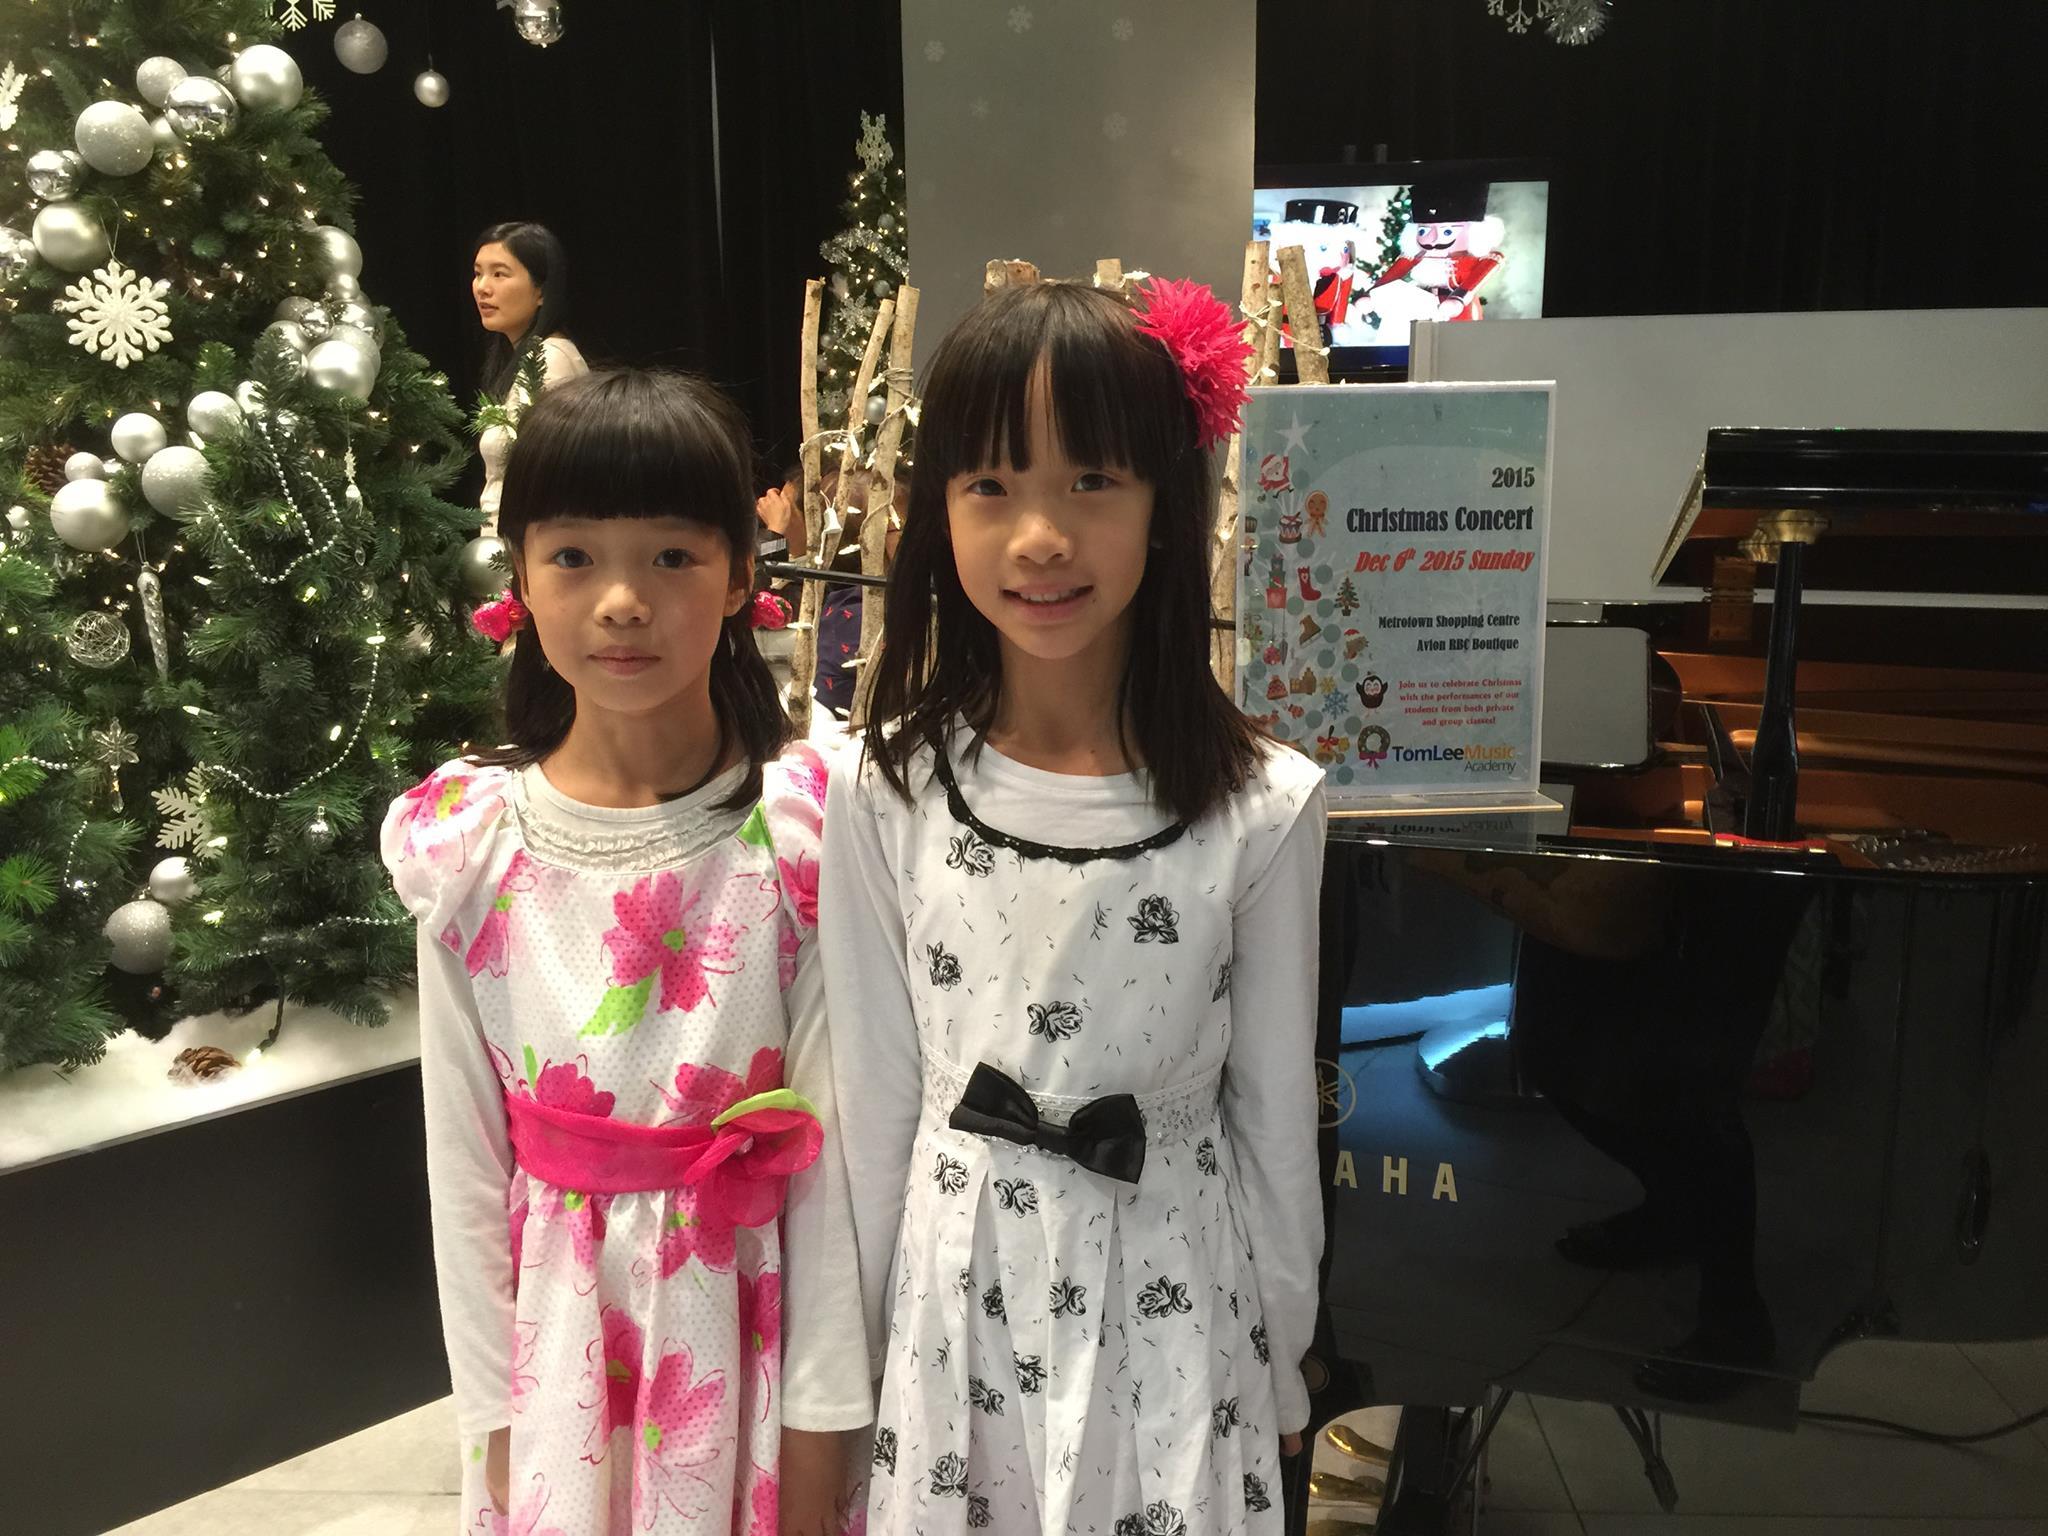 Tom Lee Music Blog School Events & Concerts